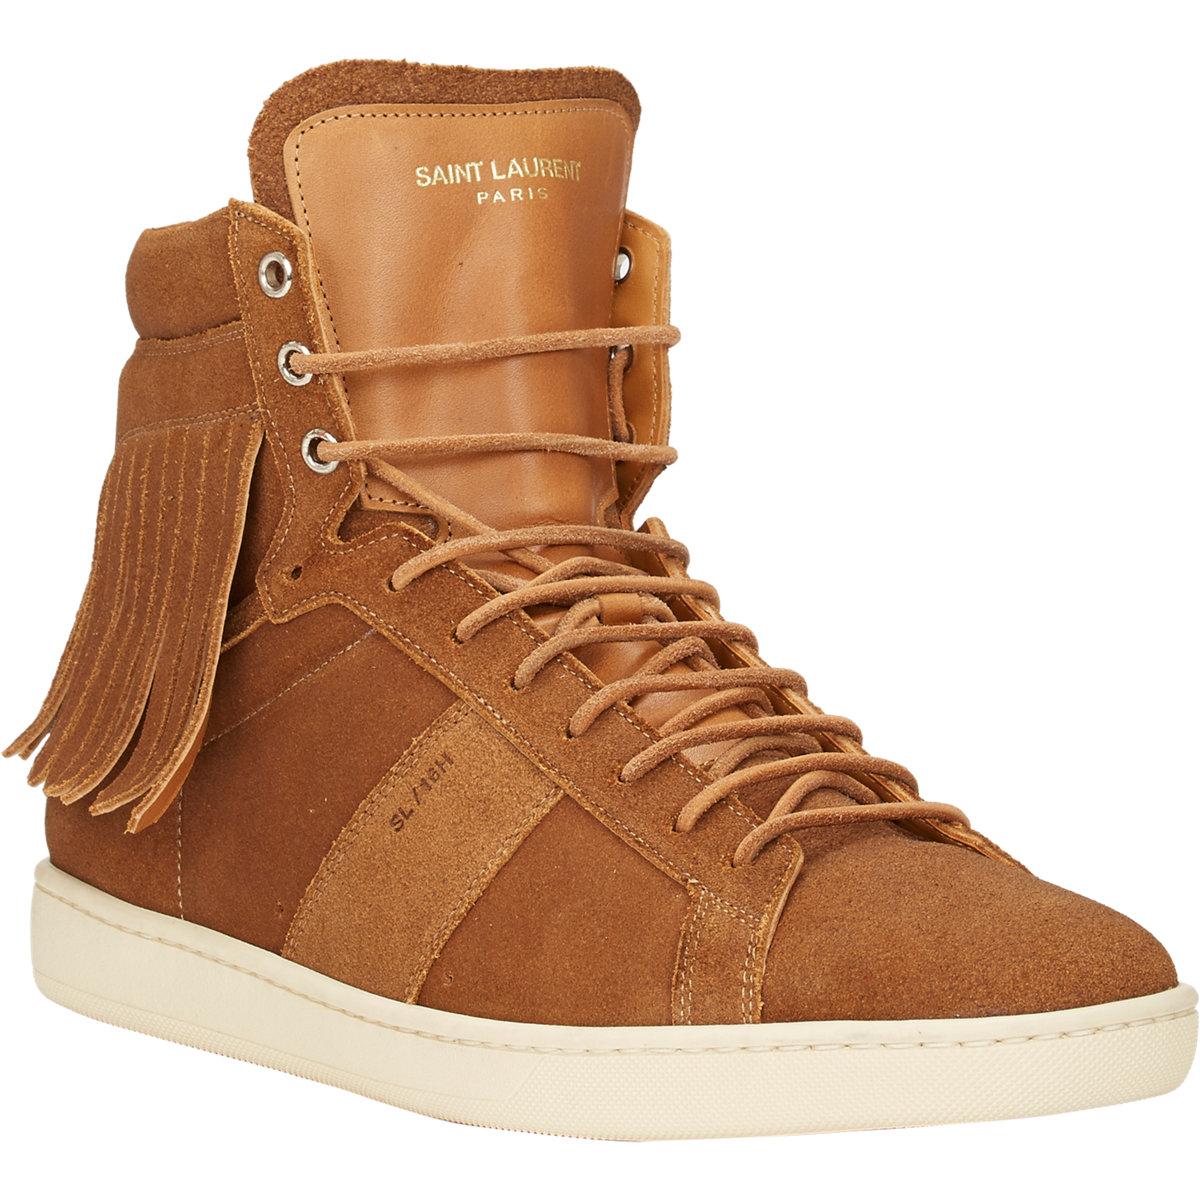 saint laurent fringe sl 16h court classic sneakers in brown for men tan lyst. Black Bedroom Furniture Sets. Home Design Ideas